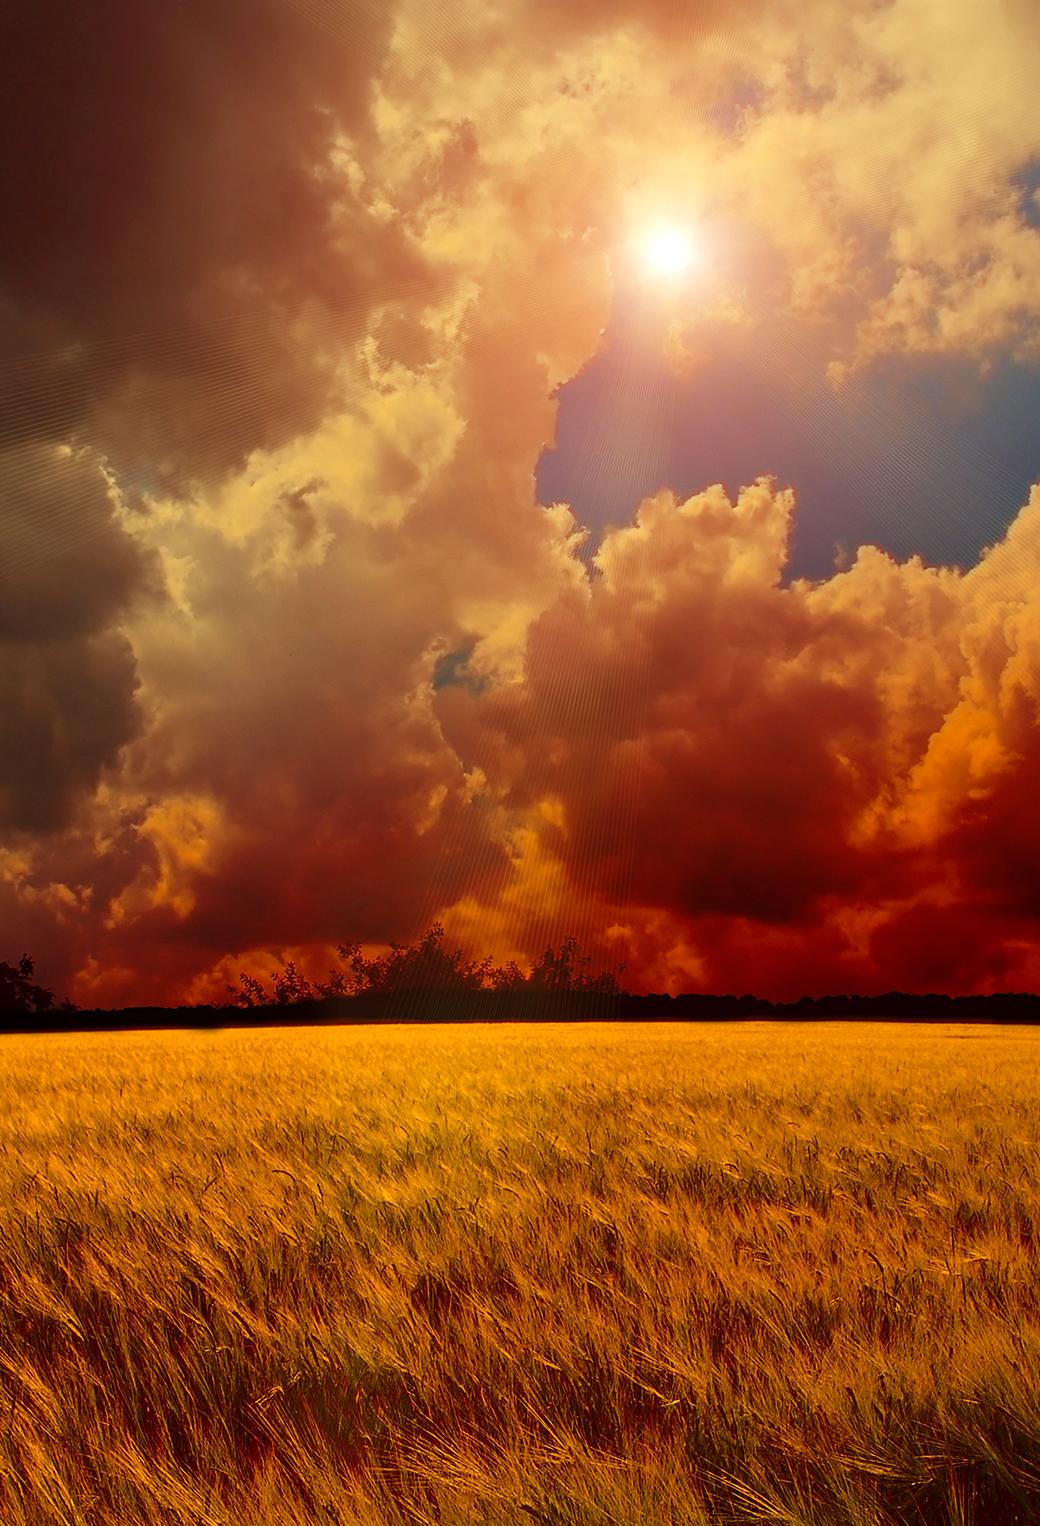 Yellow Wheat Field 3Wallpapers iPhone Parallax Yellow Wheat Field